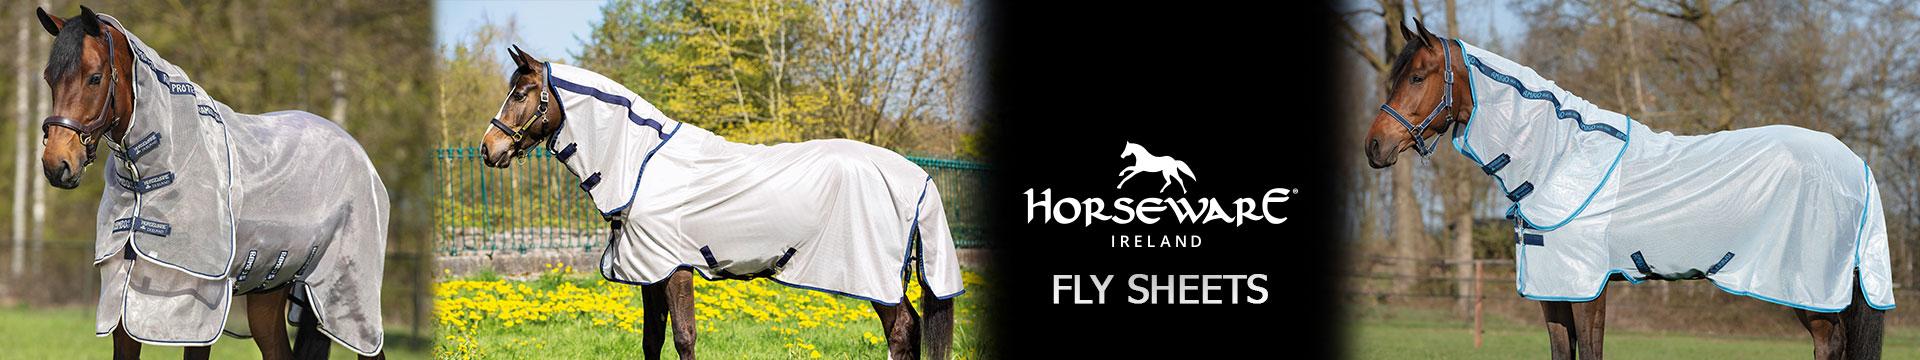 Horseware Fly Sheets